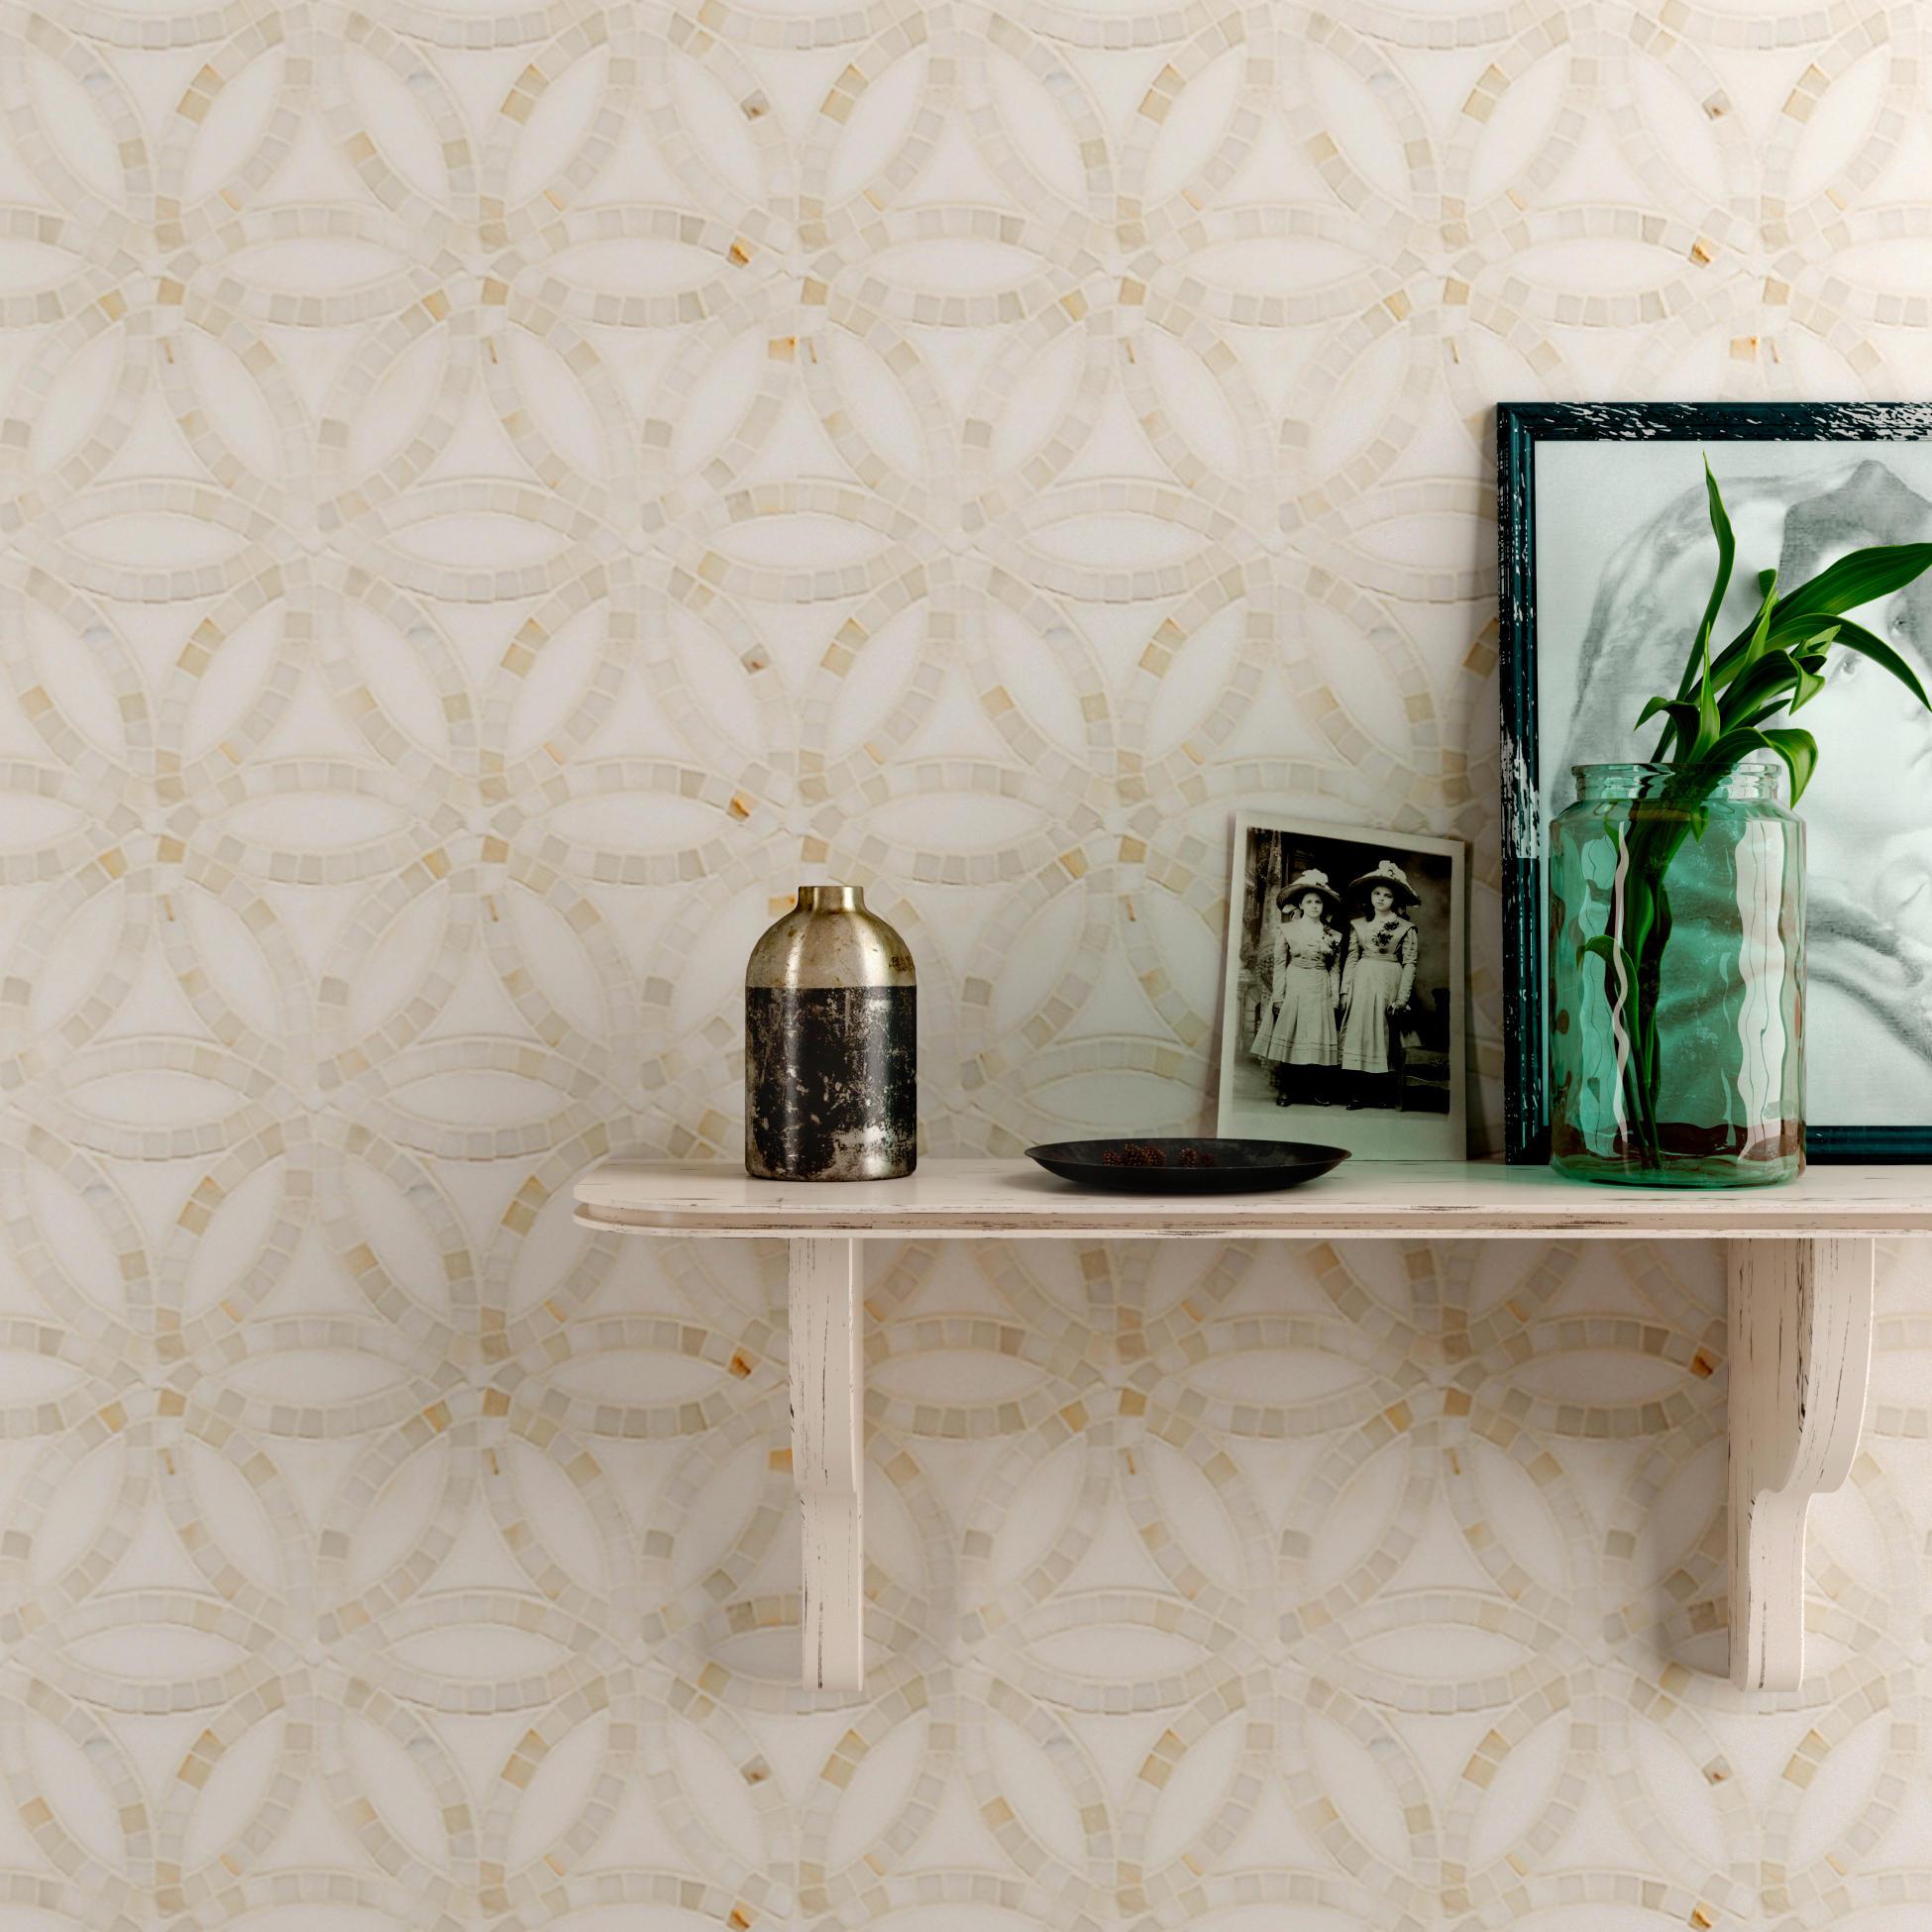 Belle epoque serpentine natural stone tiles from claybrook interiors ltd - Belle epoque interiors ...